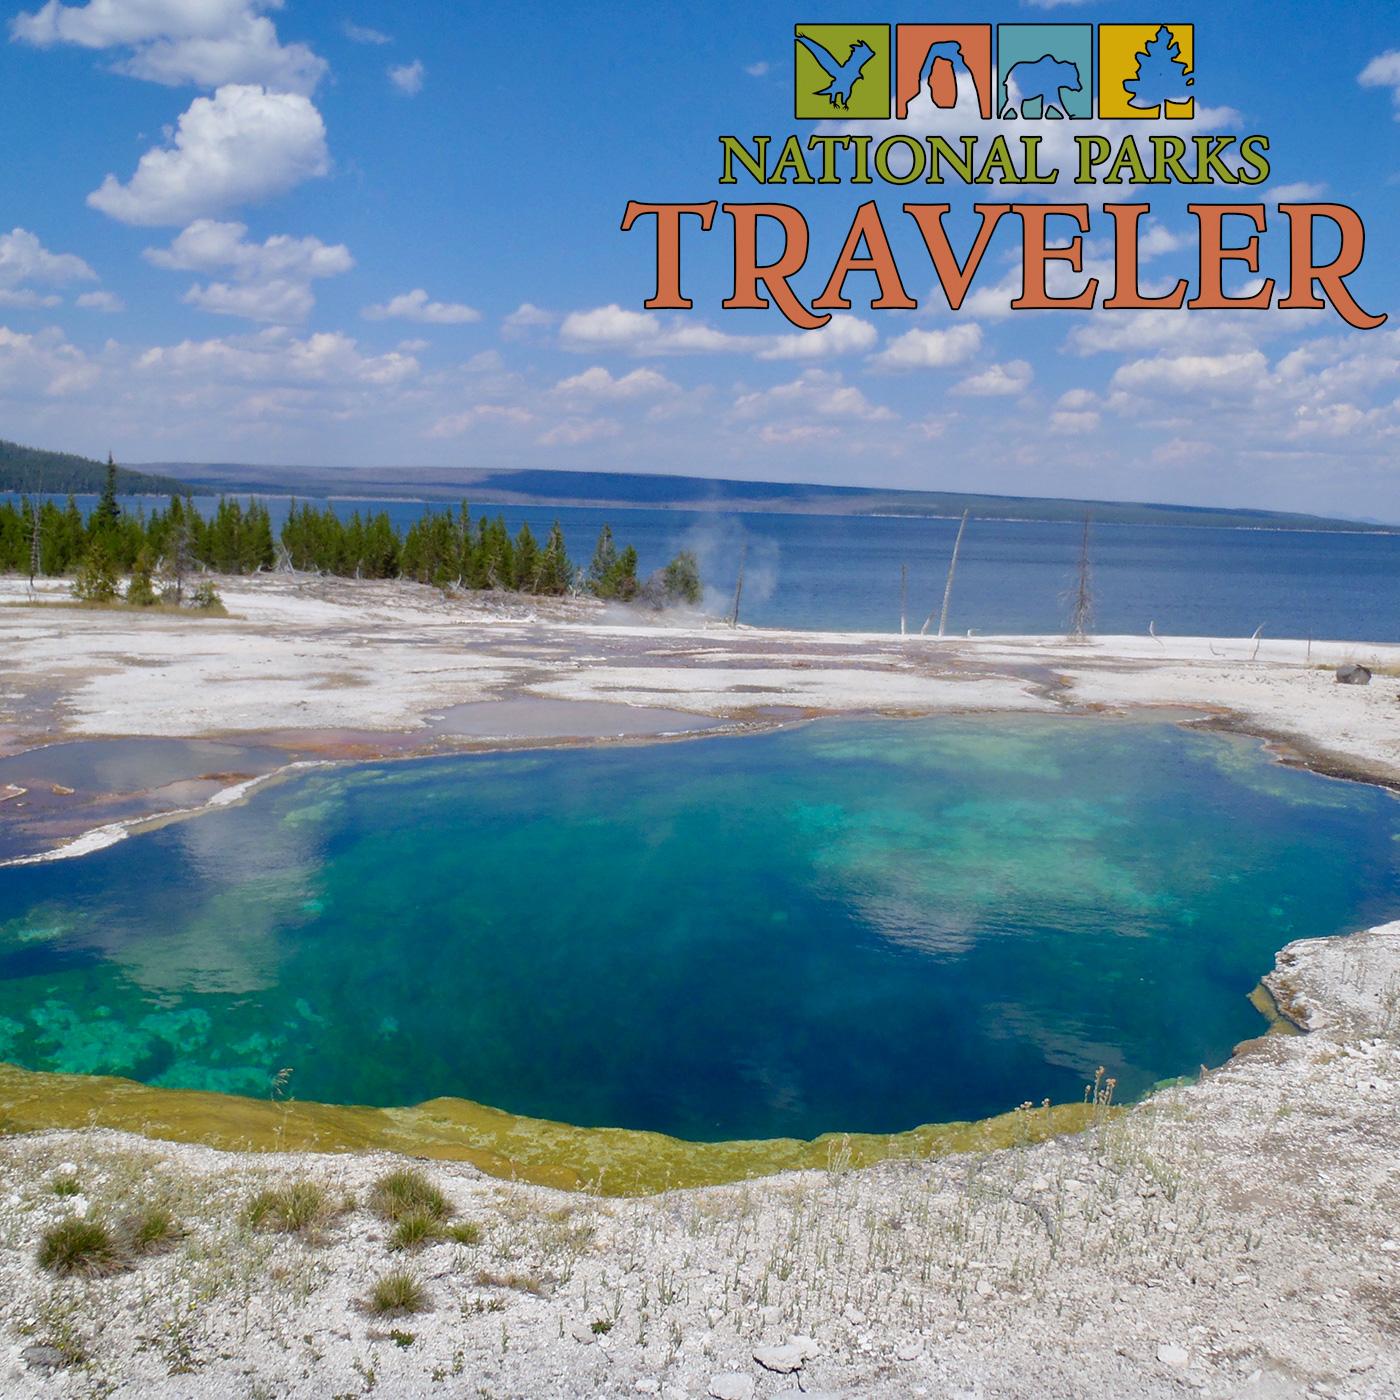 National Parks Traveler Podcast show art